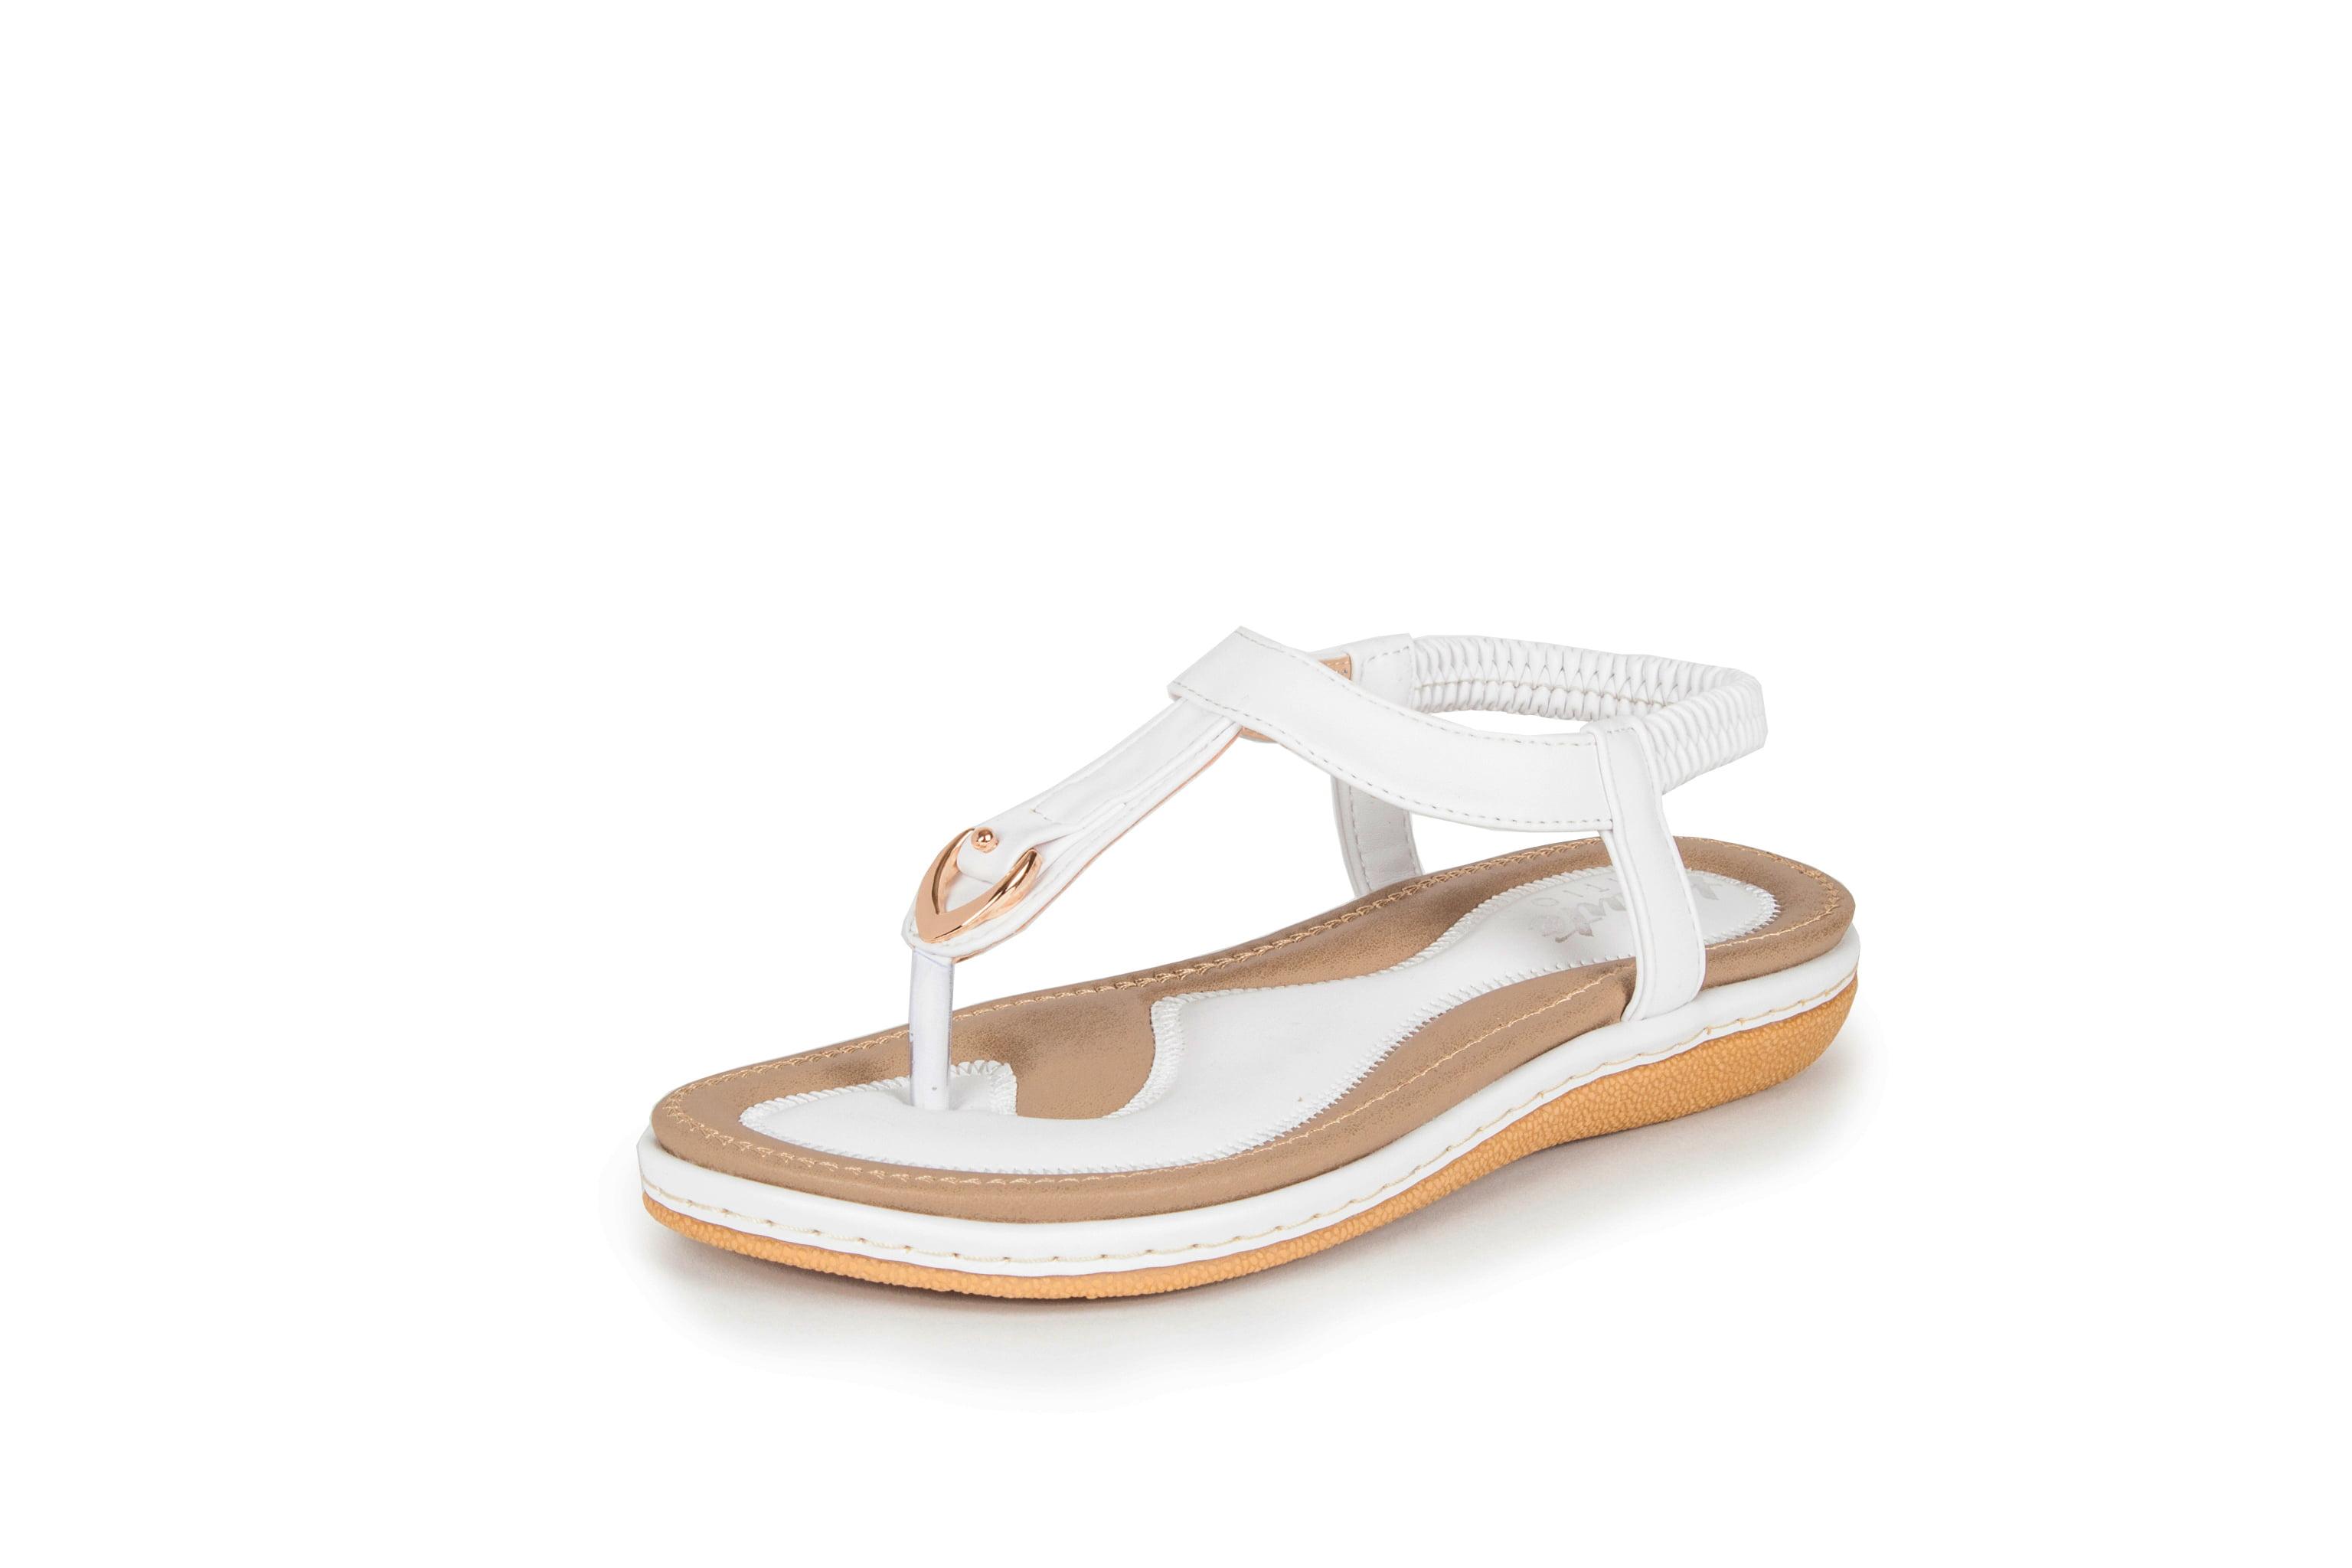 JAGENIE Summer Soft Women Wedge Sandals Thong Flip Flops Platform Slippers Beach Black 36